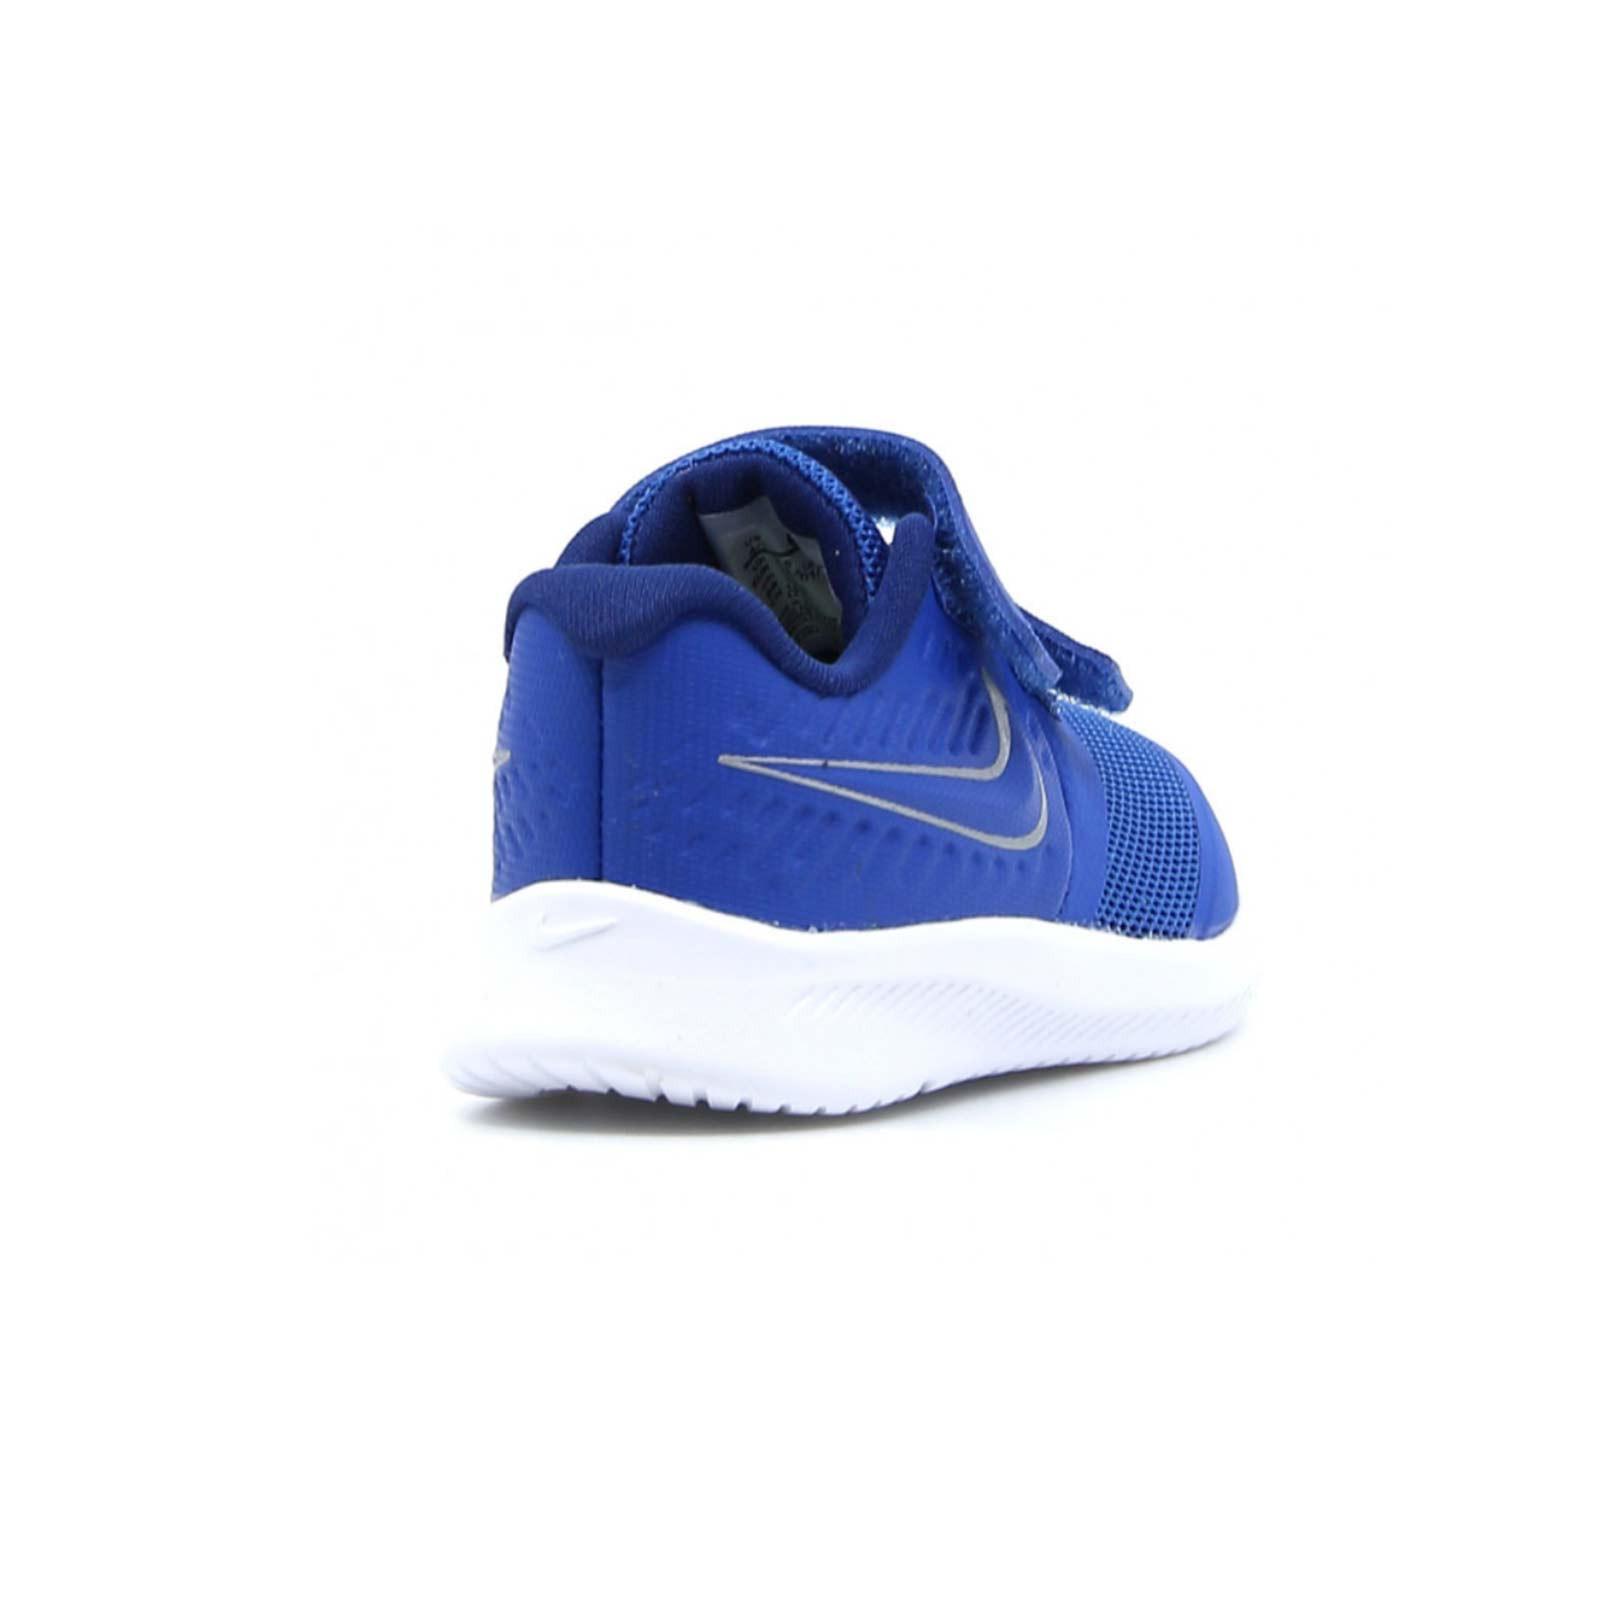 fertilizante Inspección ola  Zapatillas Nike Star Runner 2 Psv Running para Niño | Runa Store